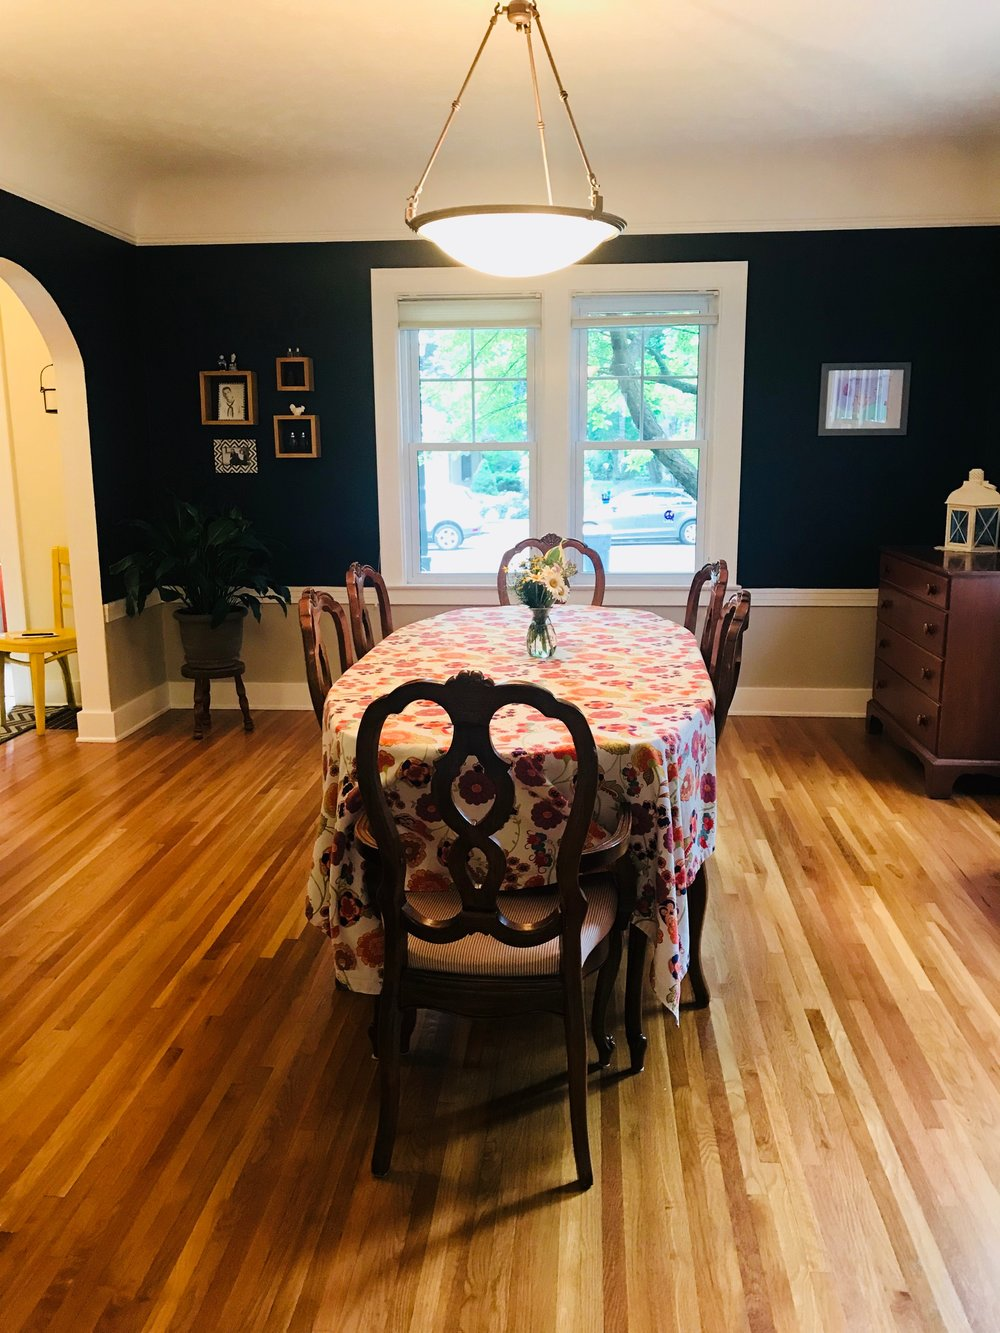 864 CADILLAC DINING ROOM 2 (1).jpg